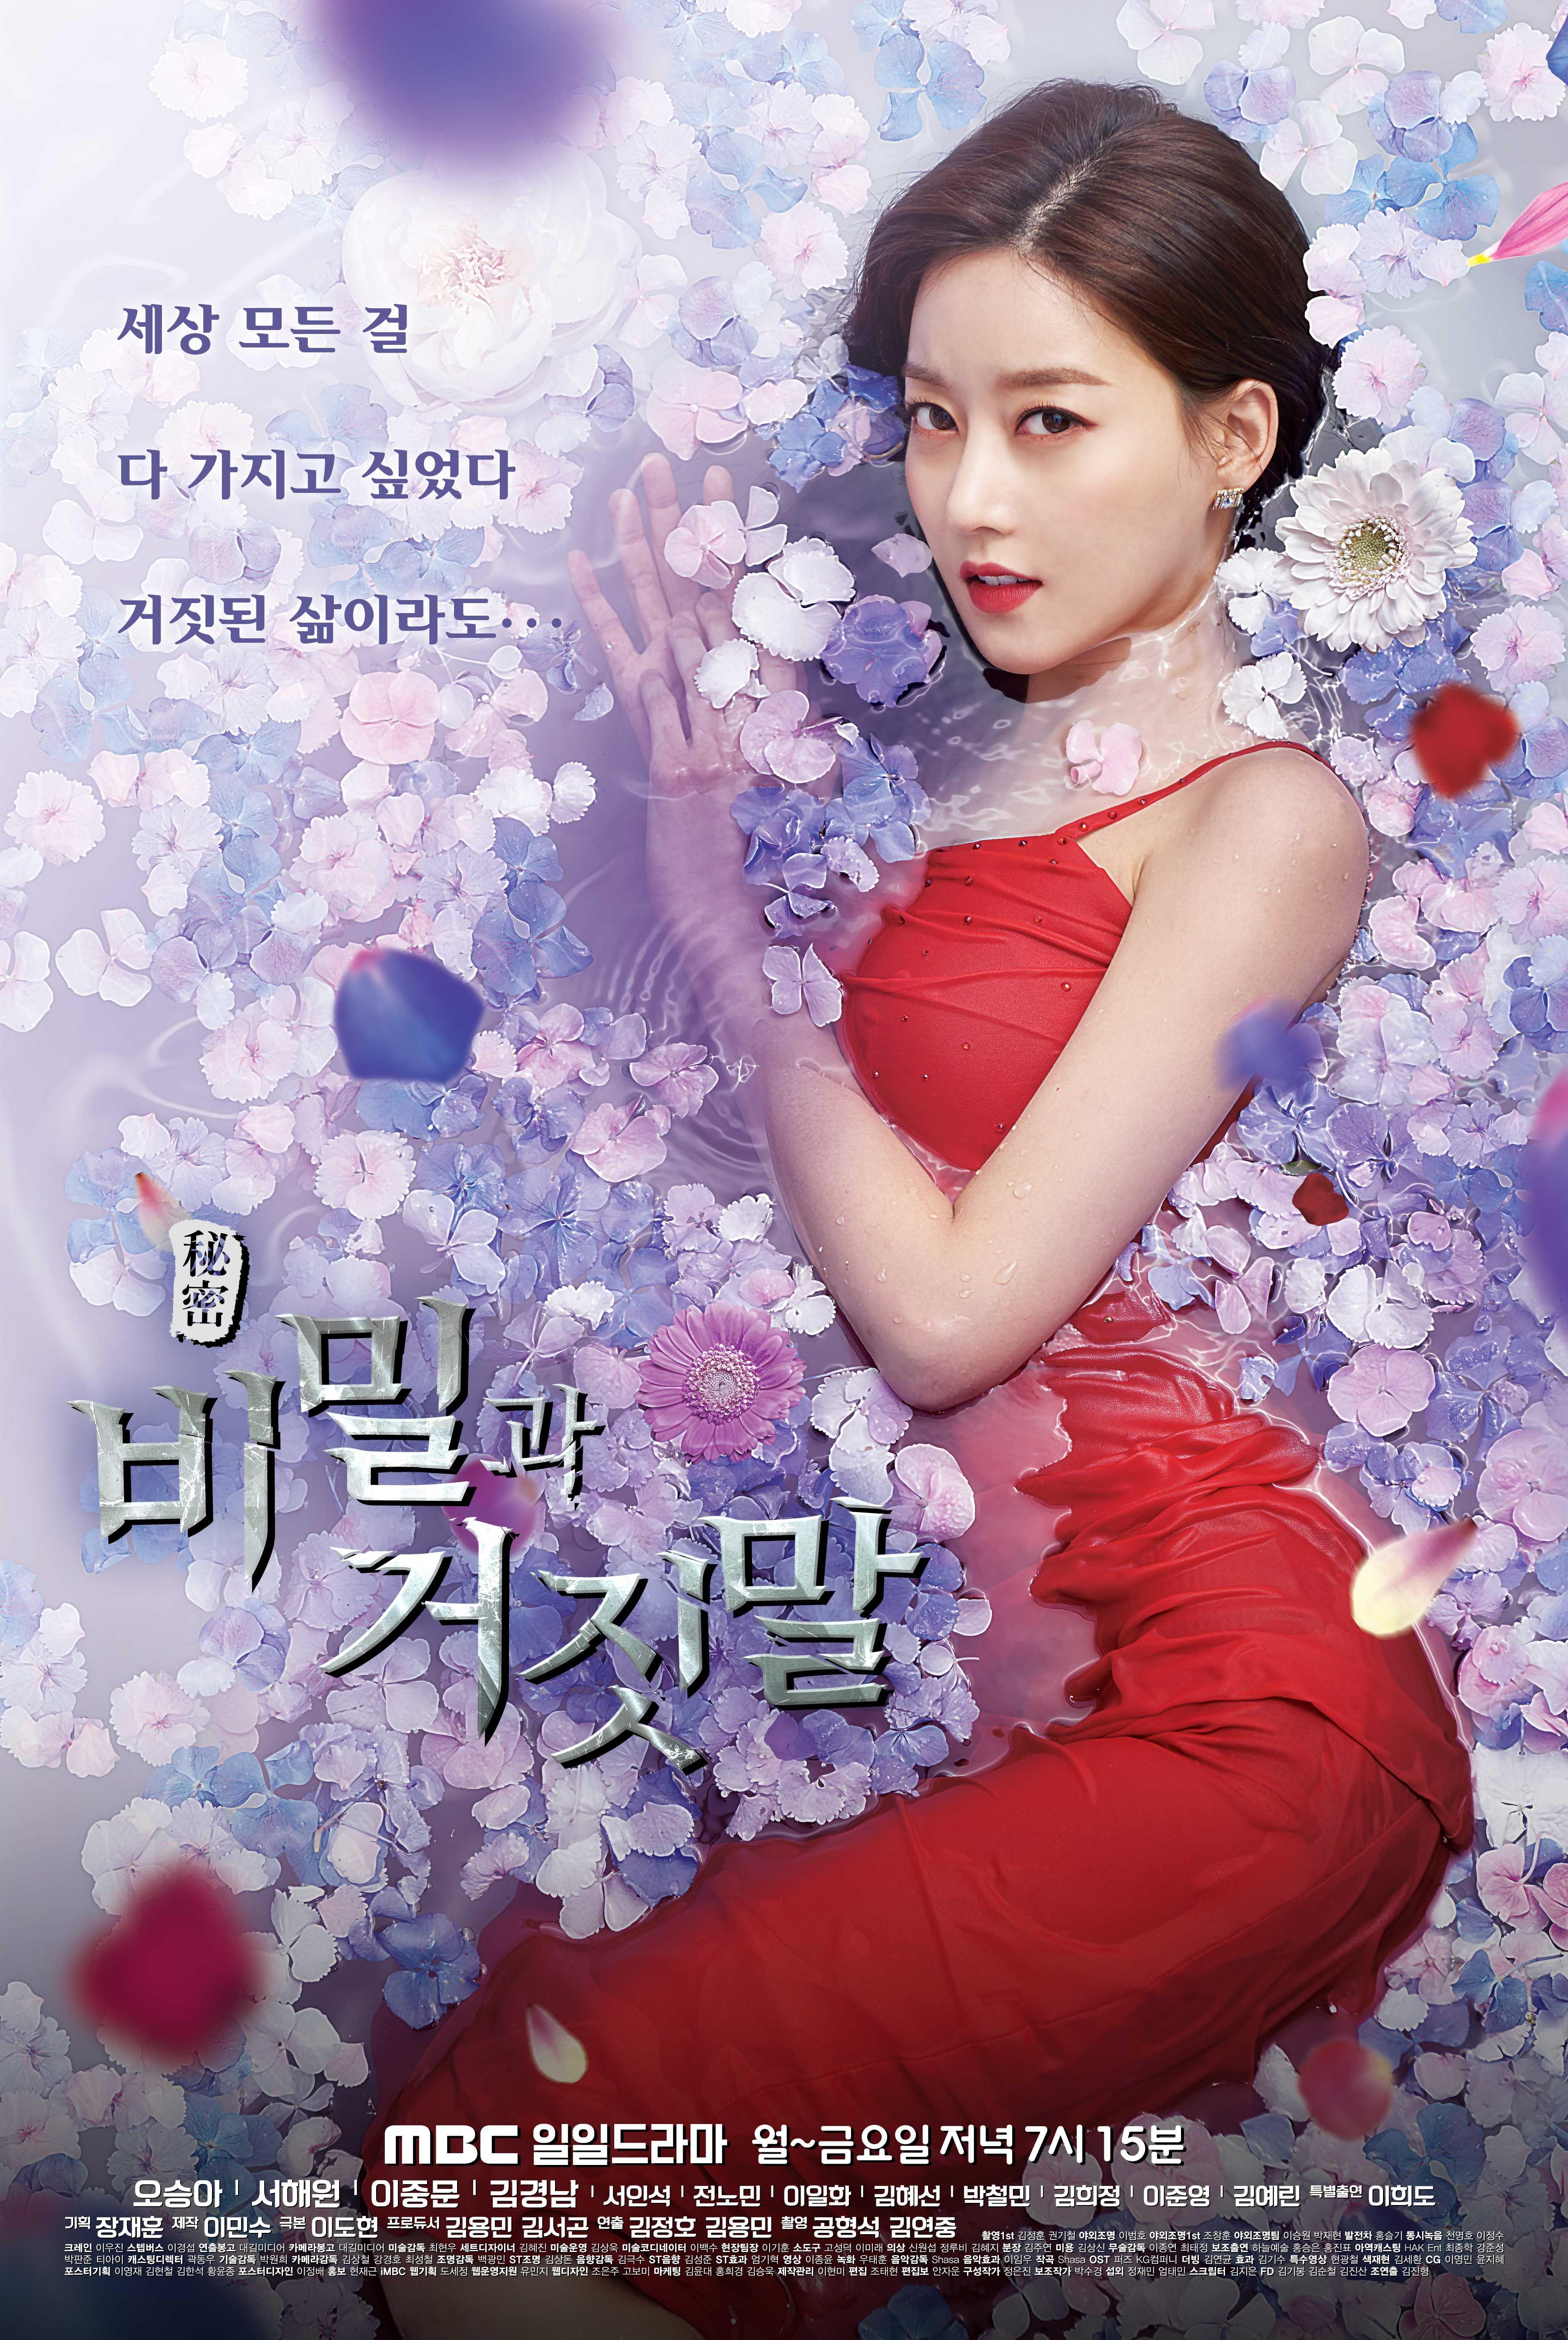 Dramas Secrets and Lies / 비밀과 거짓말 (2018) korean